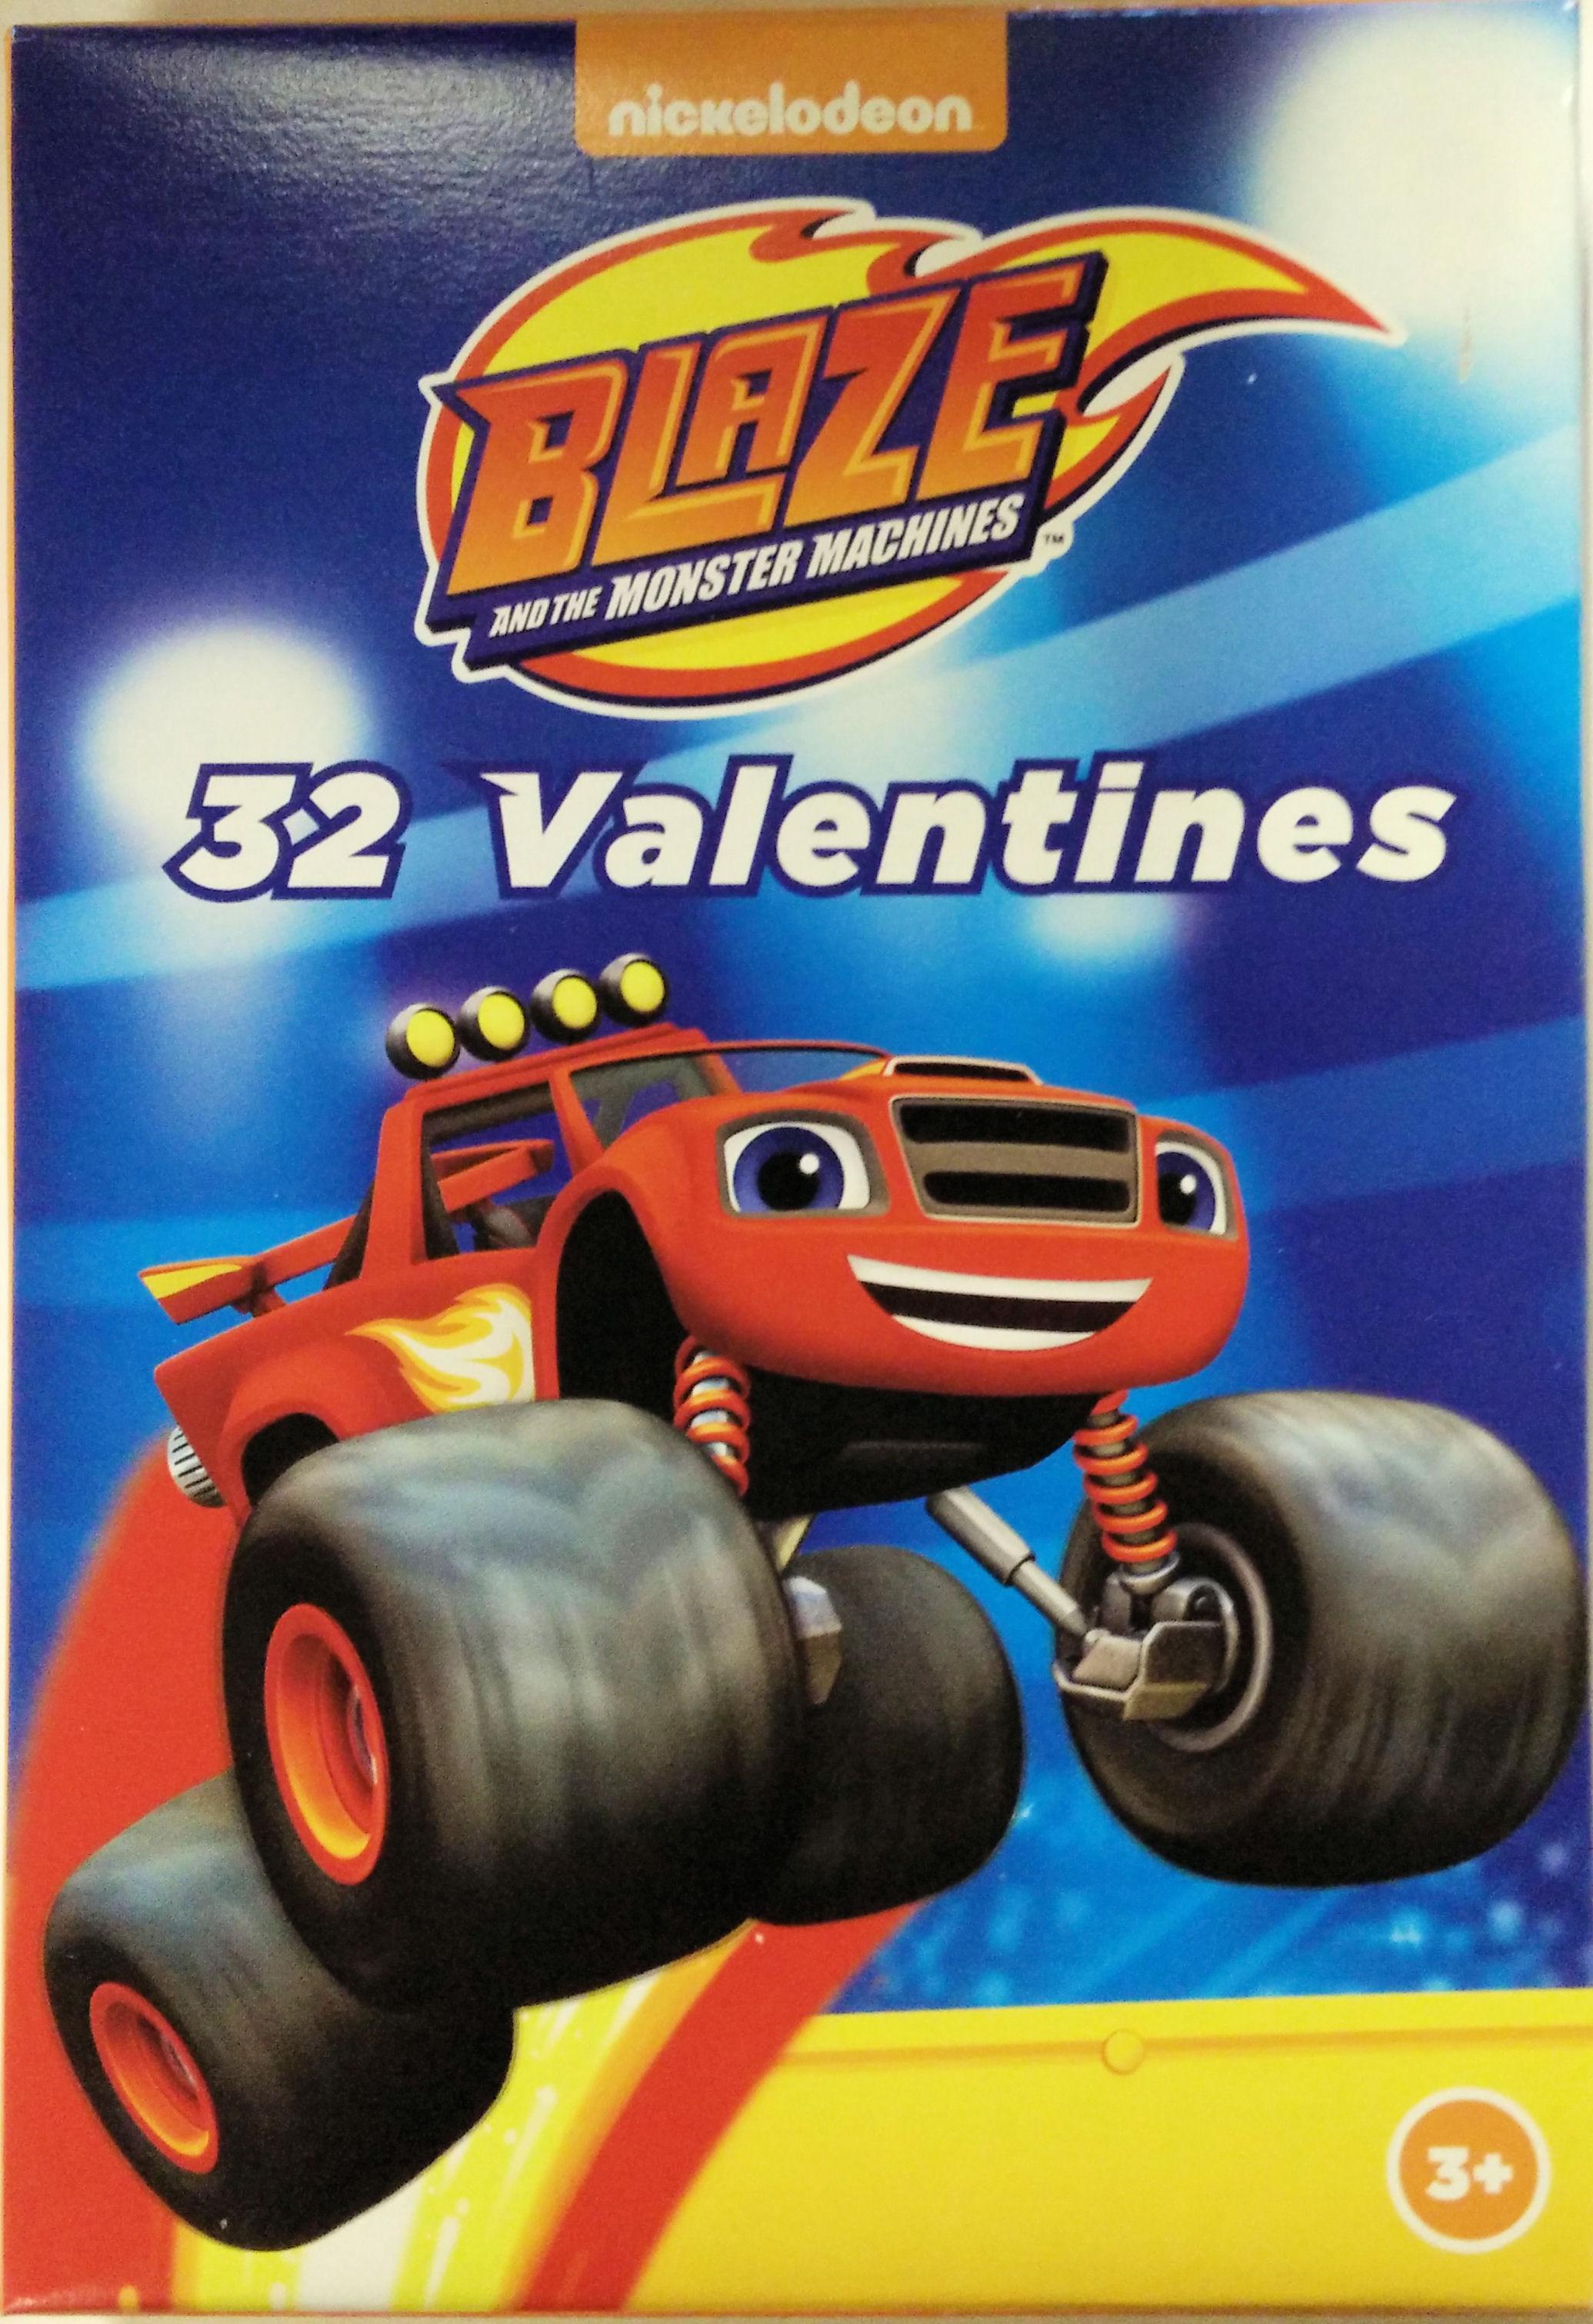 Nickelodeon Blaze 32 Valentines Cards